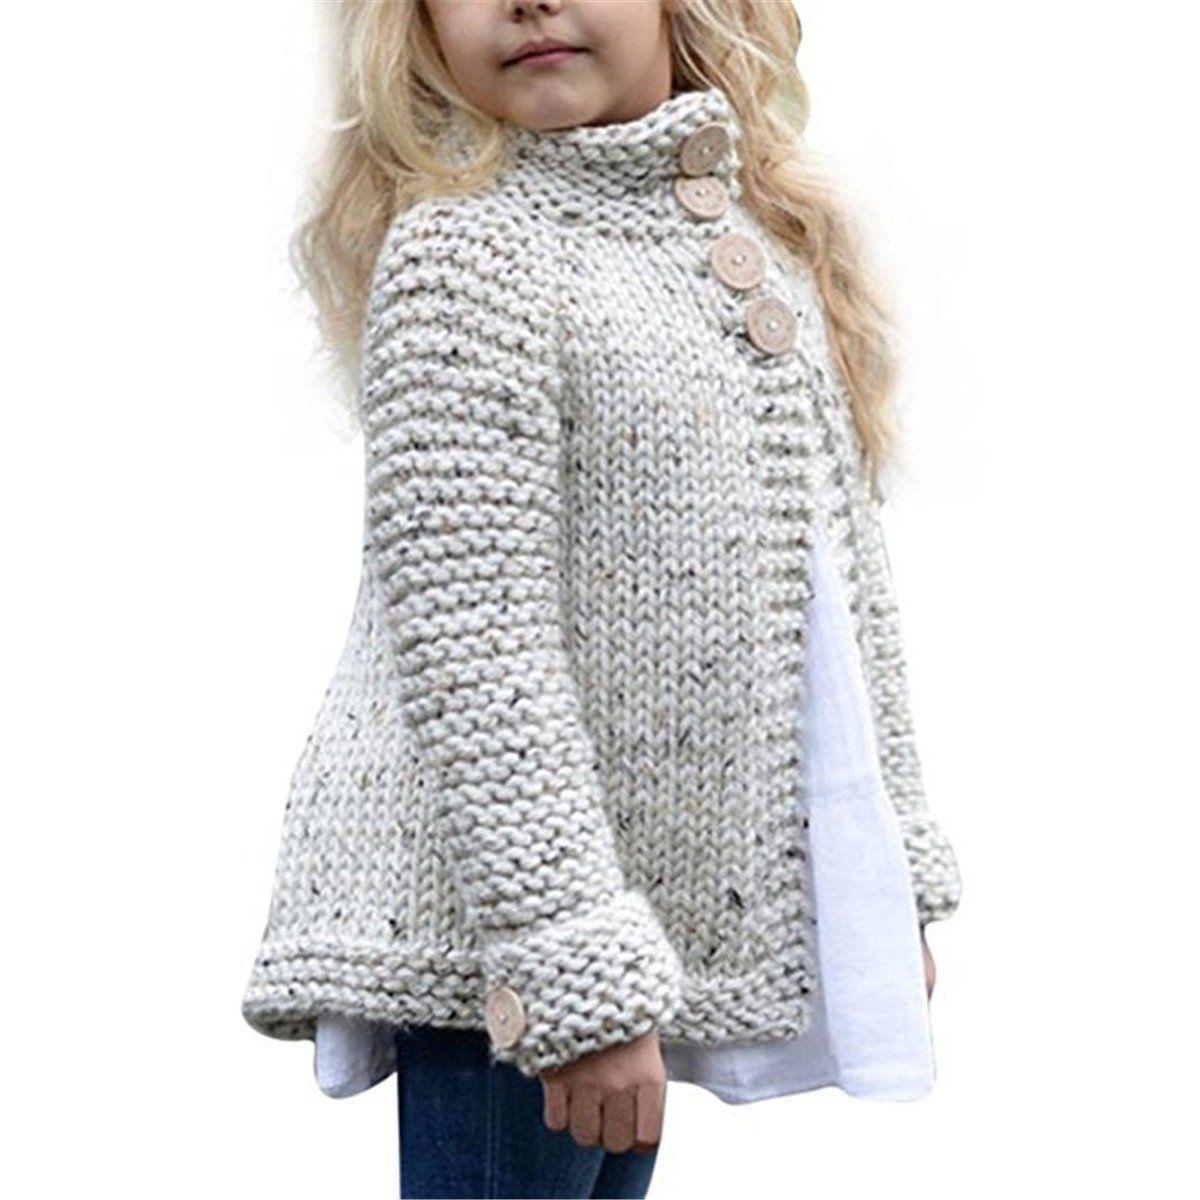 9163283e9d32 Baby Toddler Kid Little Girls Button Winter Warm Knitted Sweater ...